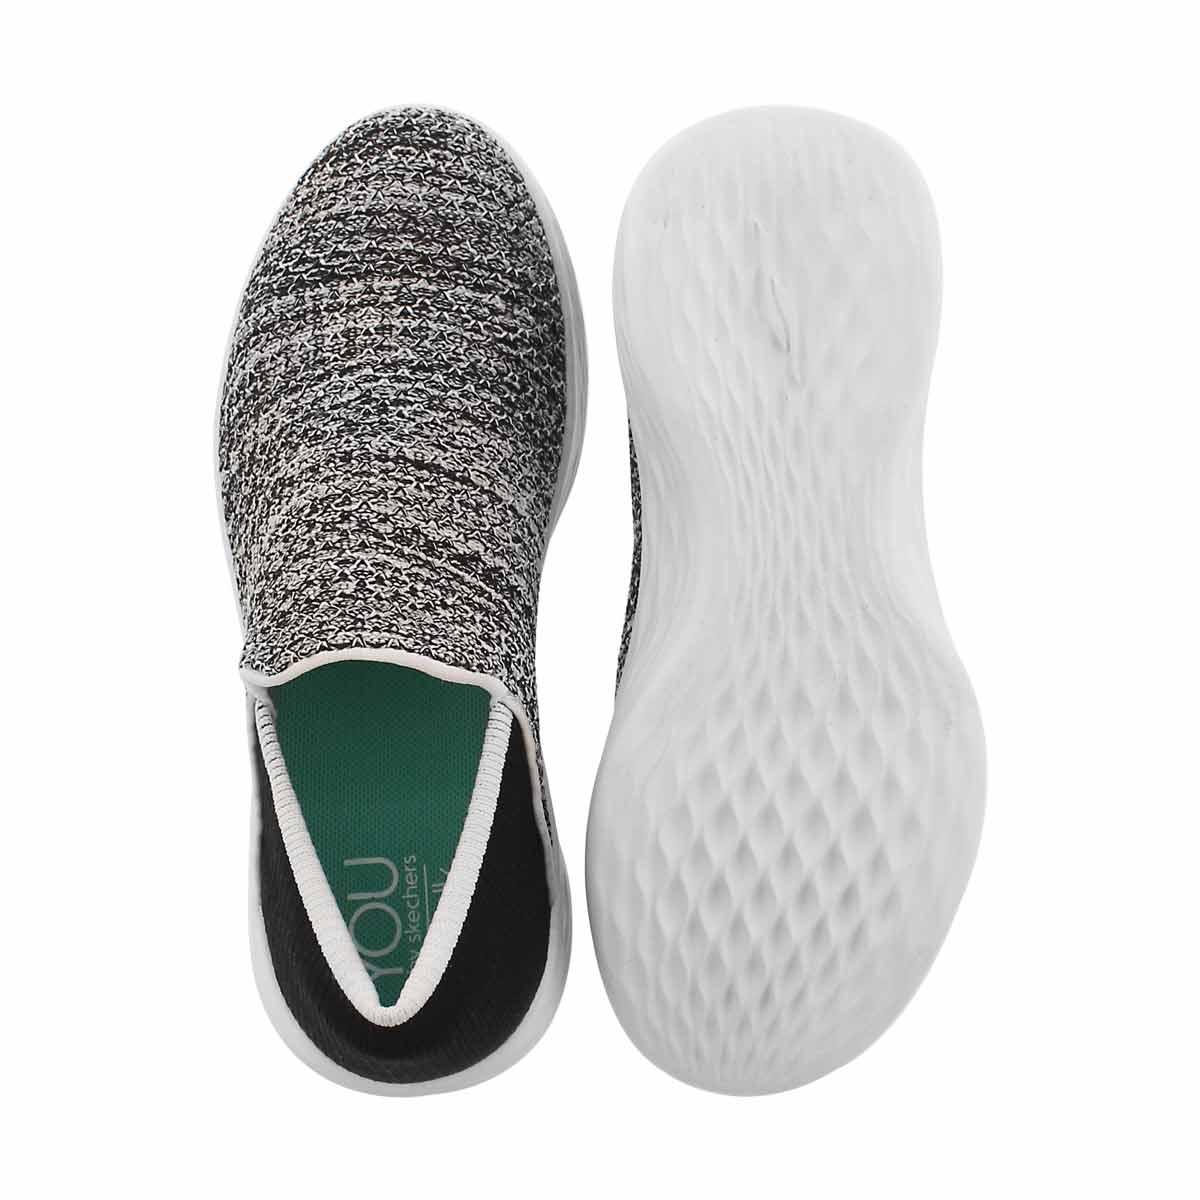 Grls You blk/wht slip on shoe